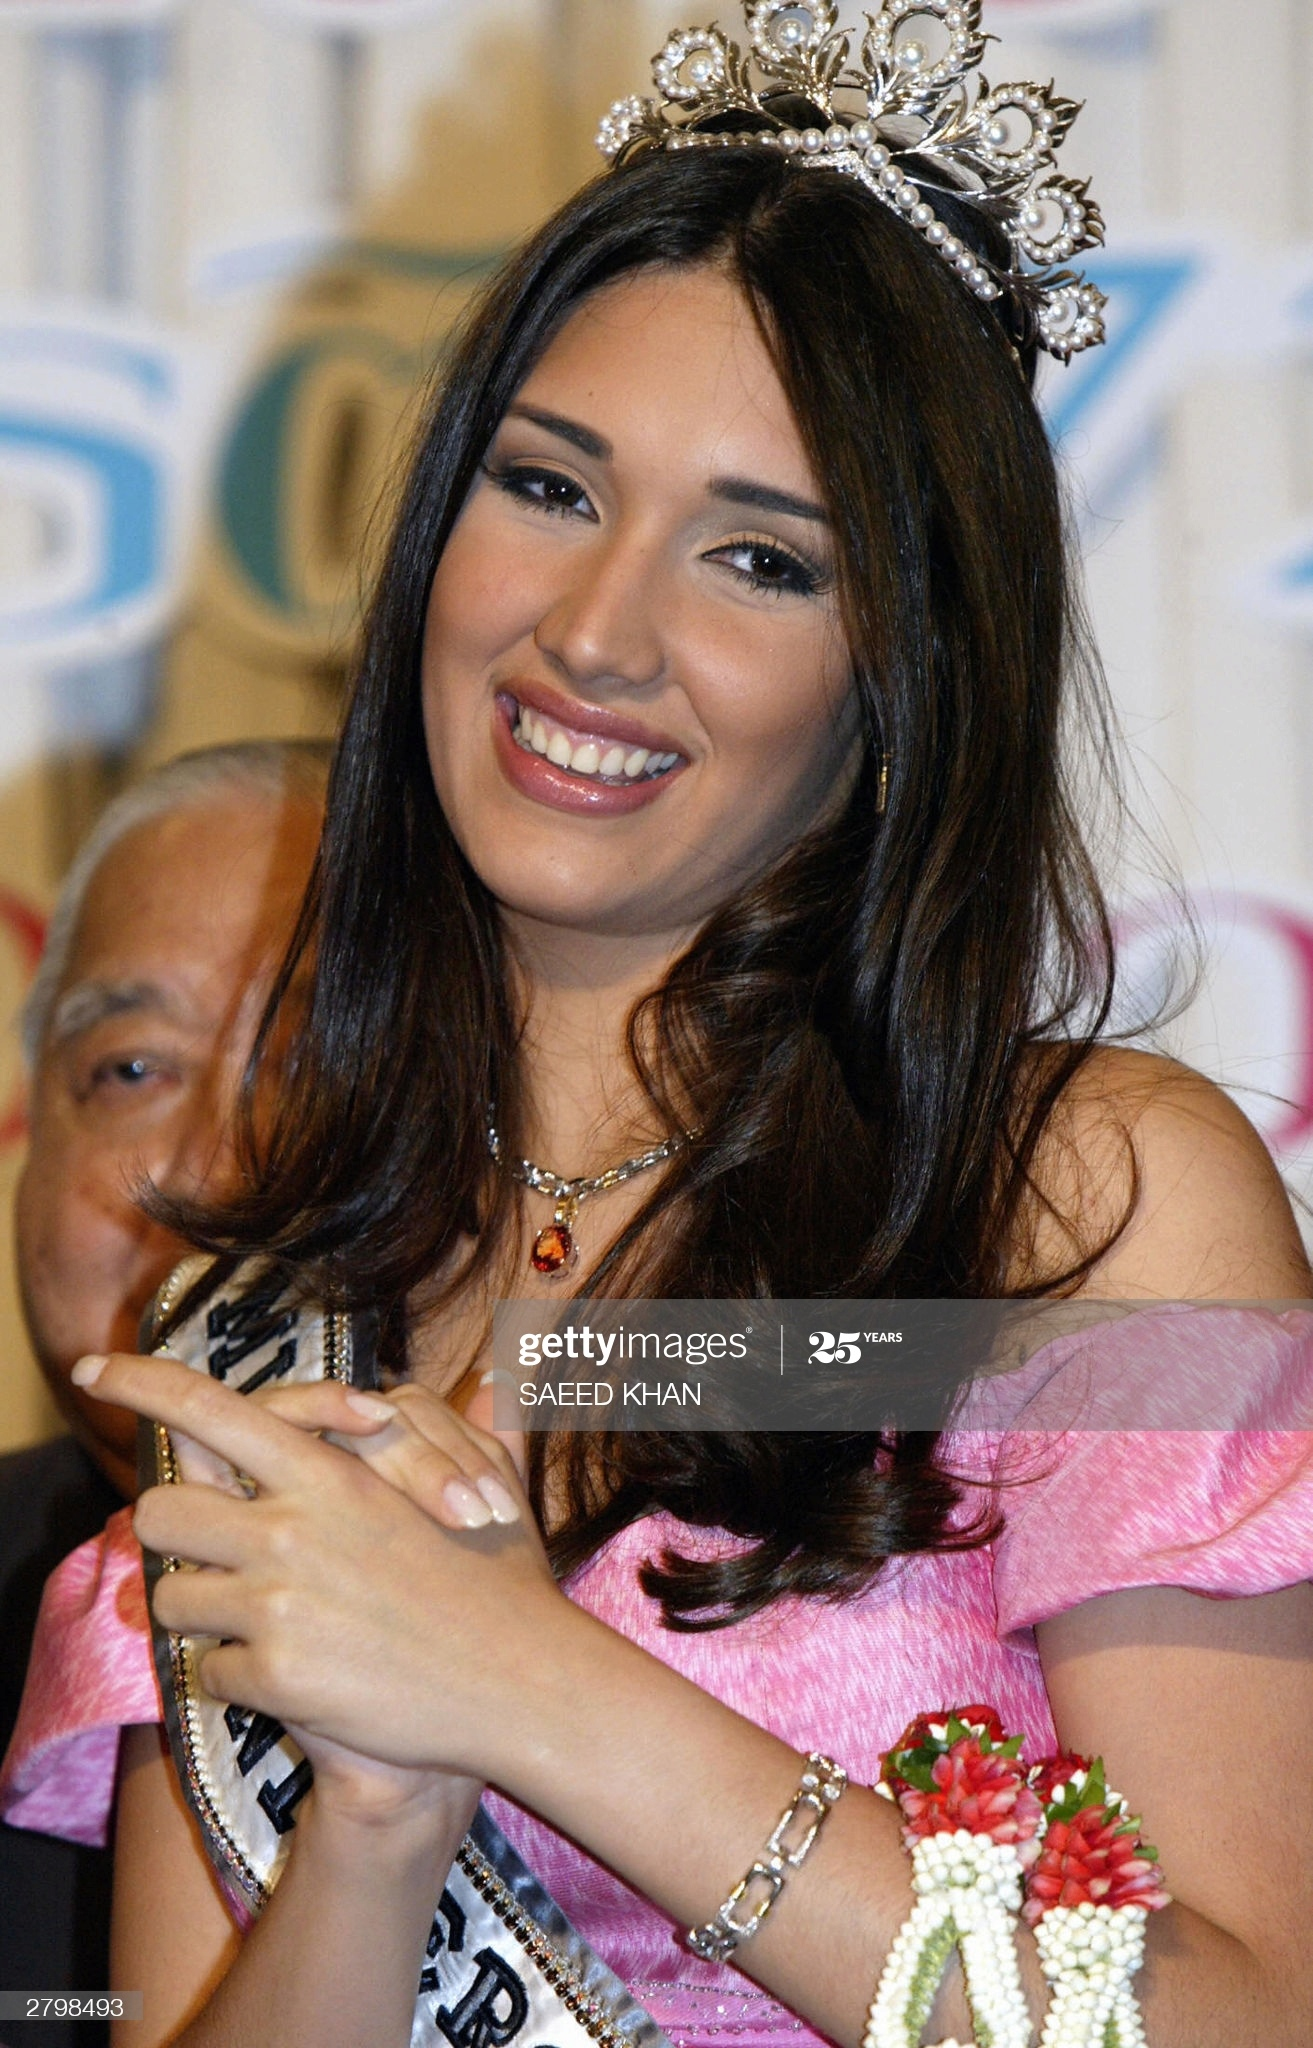 ════ ∘◦❁◦∘ ════ Amelia Vega, Miss Universe 2003. ════ ∘◦❁◦∘ ════ - Página 14 Miss-u63